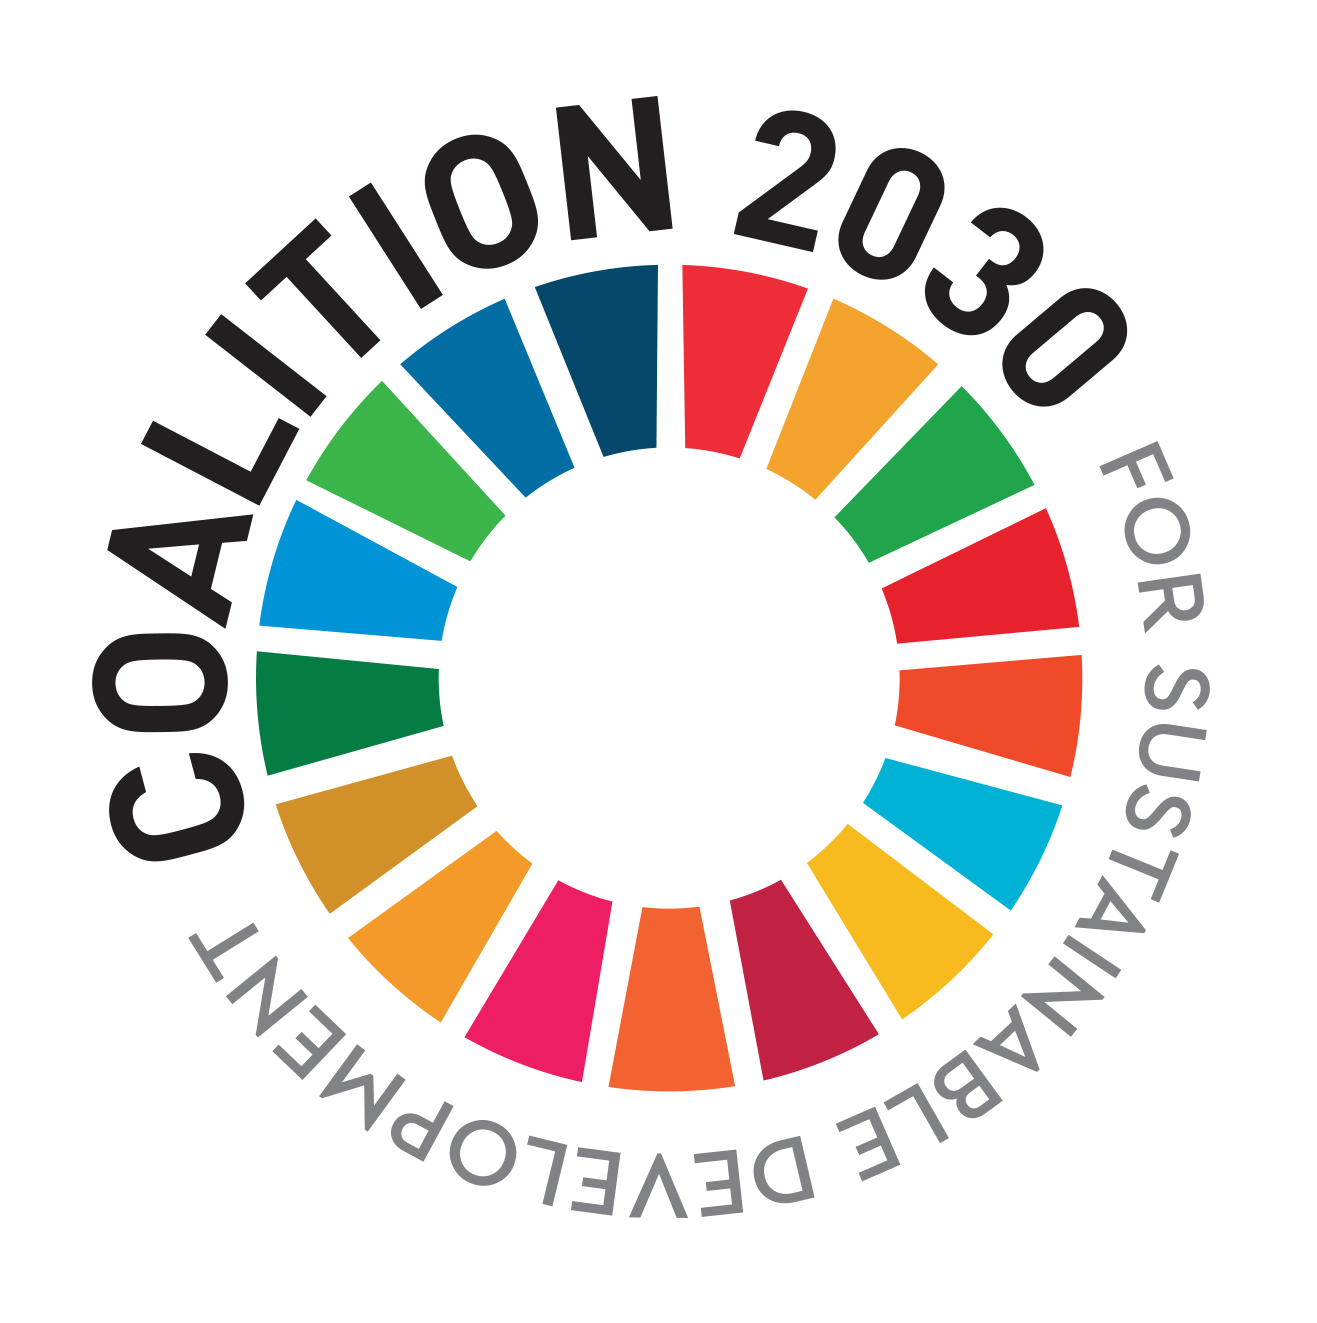 Colaition 2030 logo